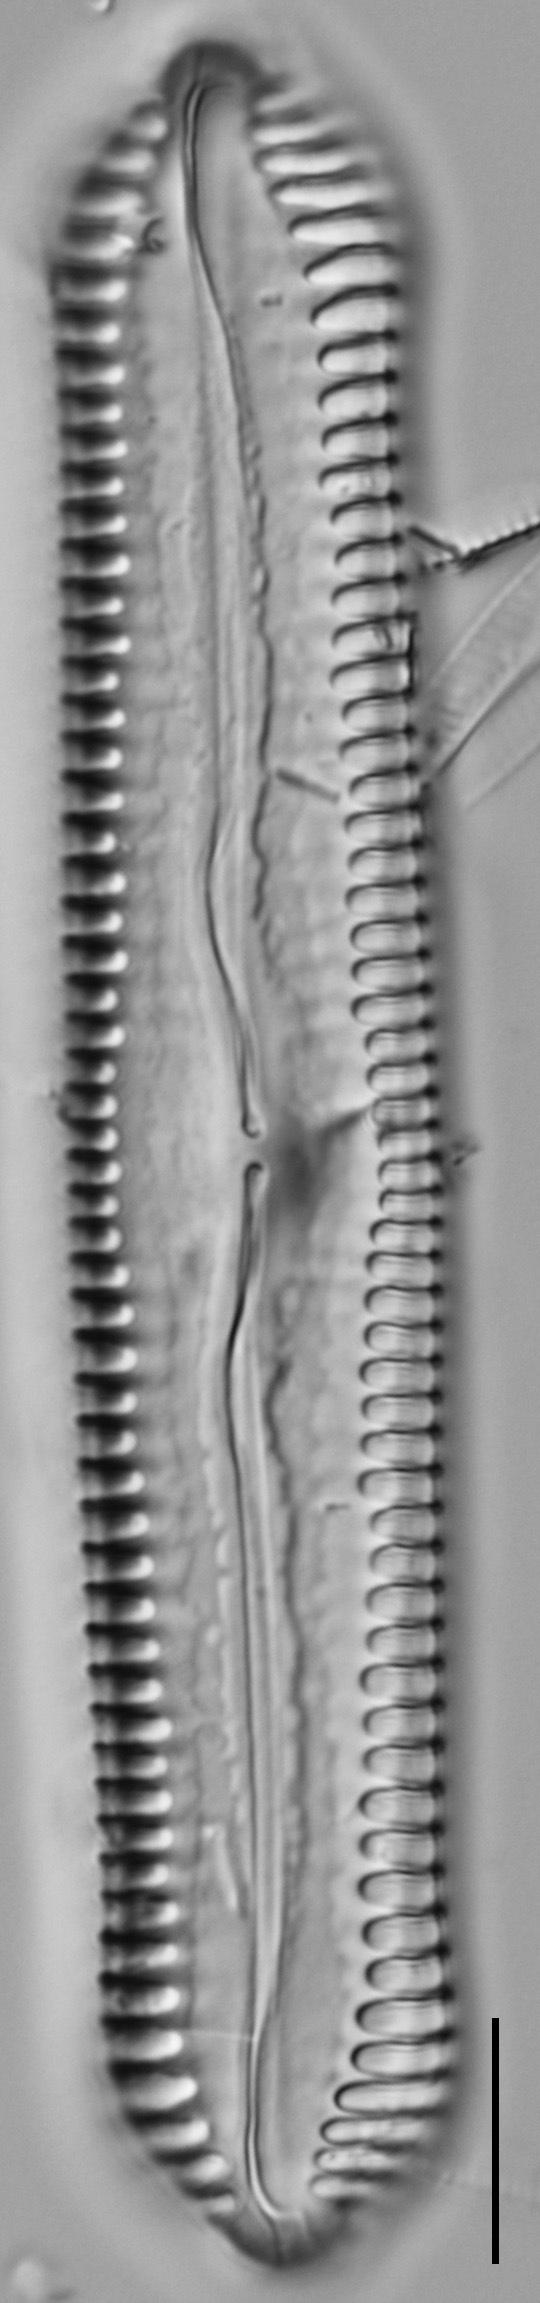 Pinnularia cuneicephala LM7